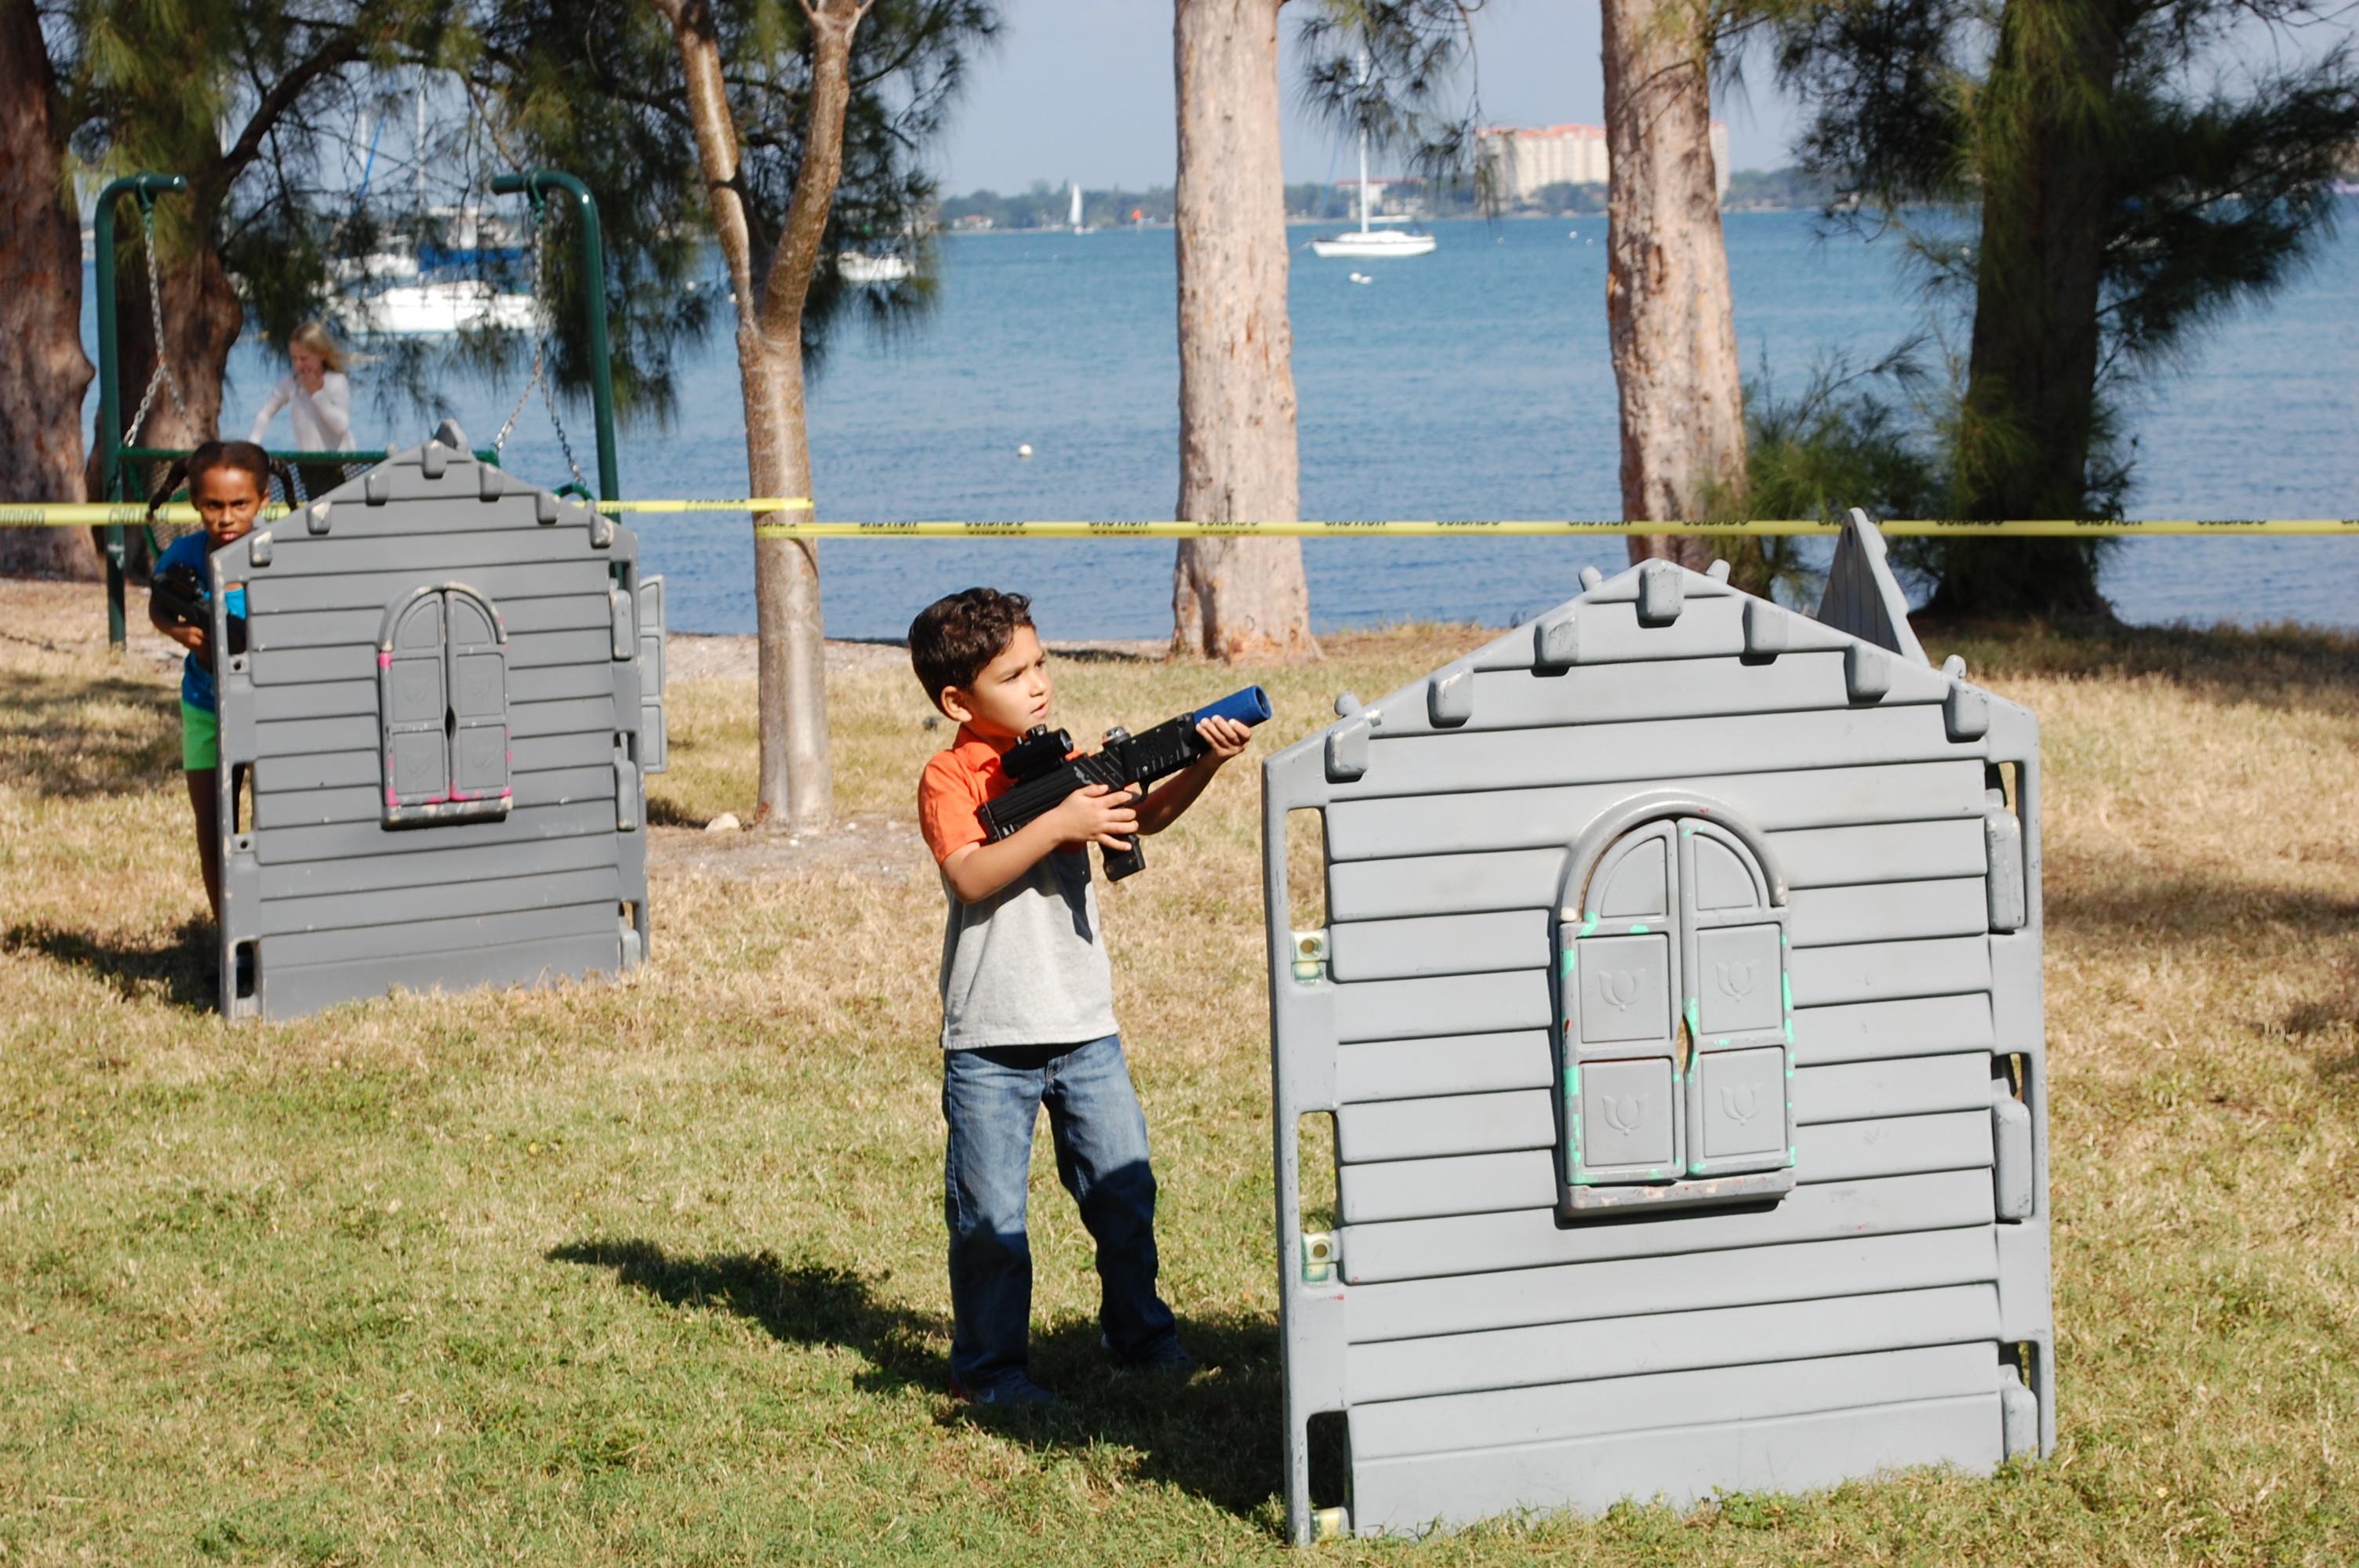 Mobile Laser Tag Lake Placid,FL